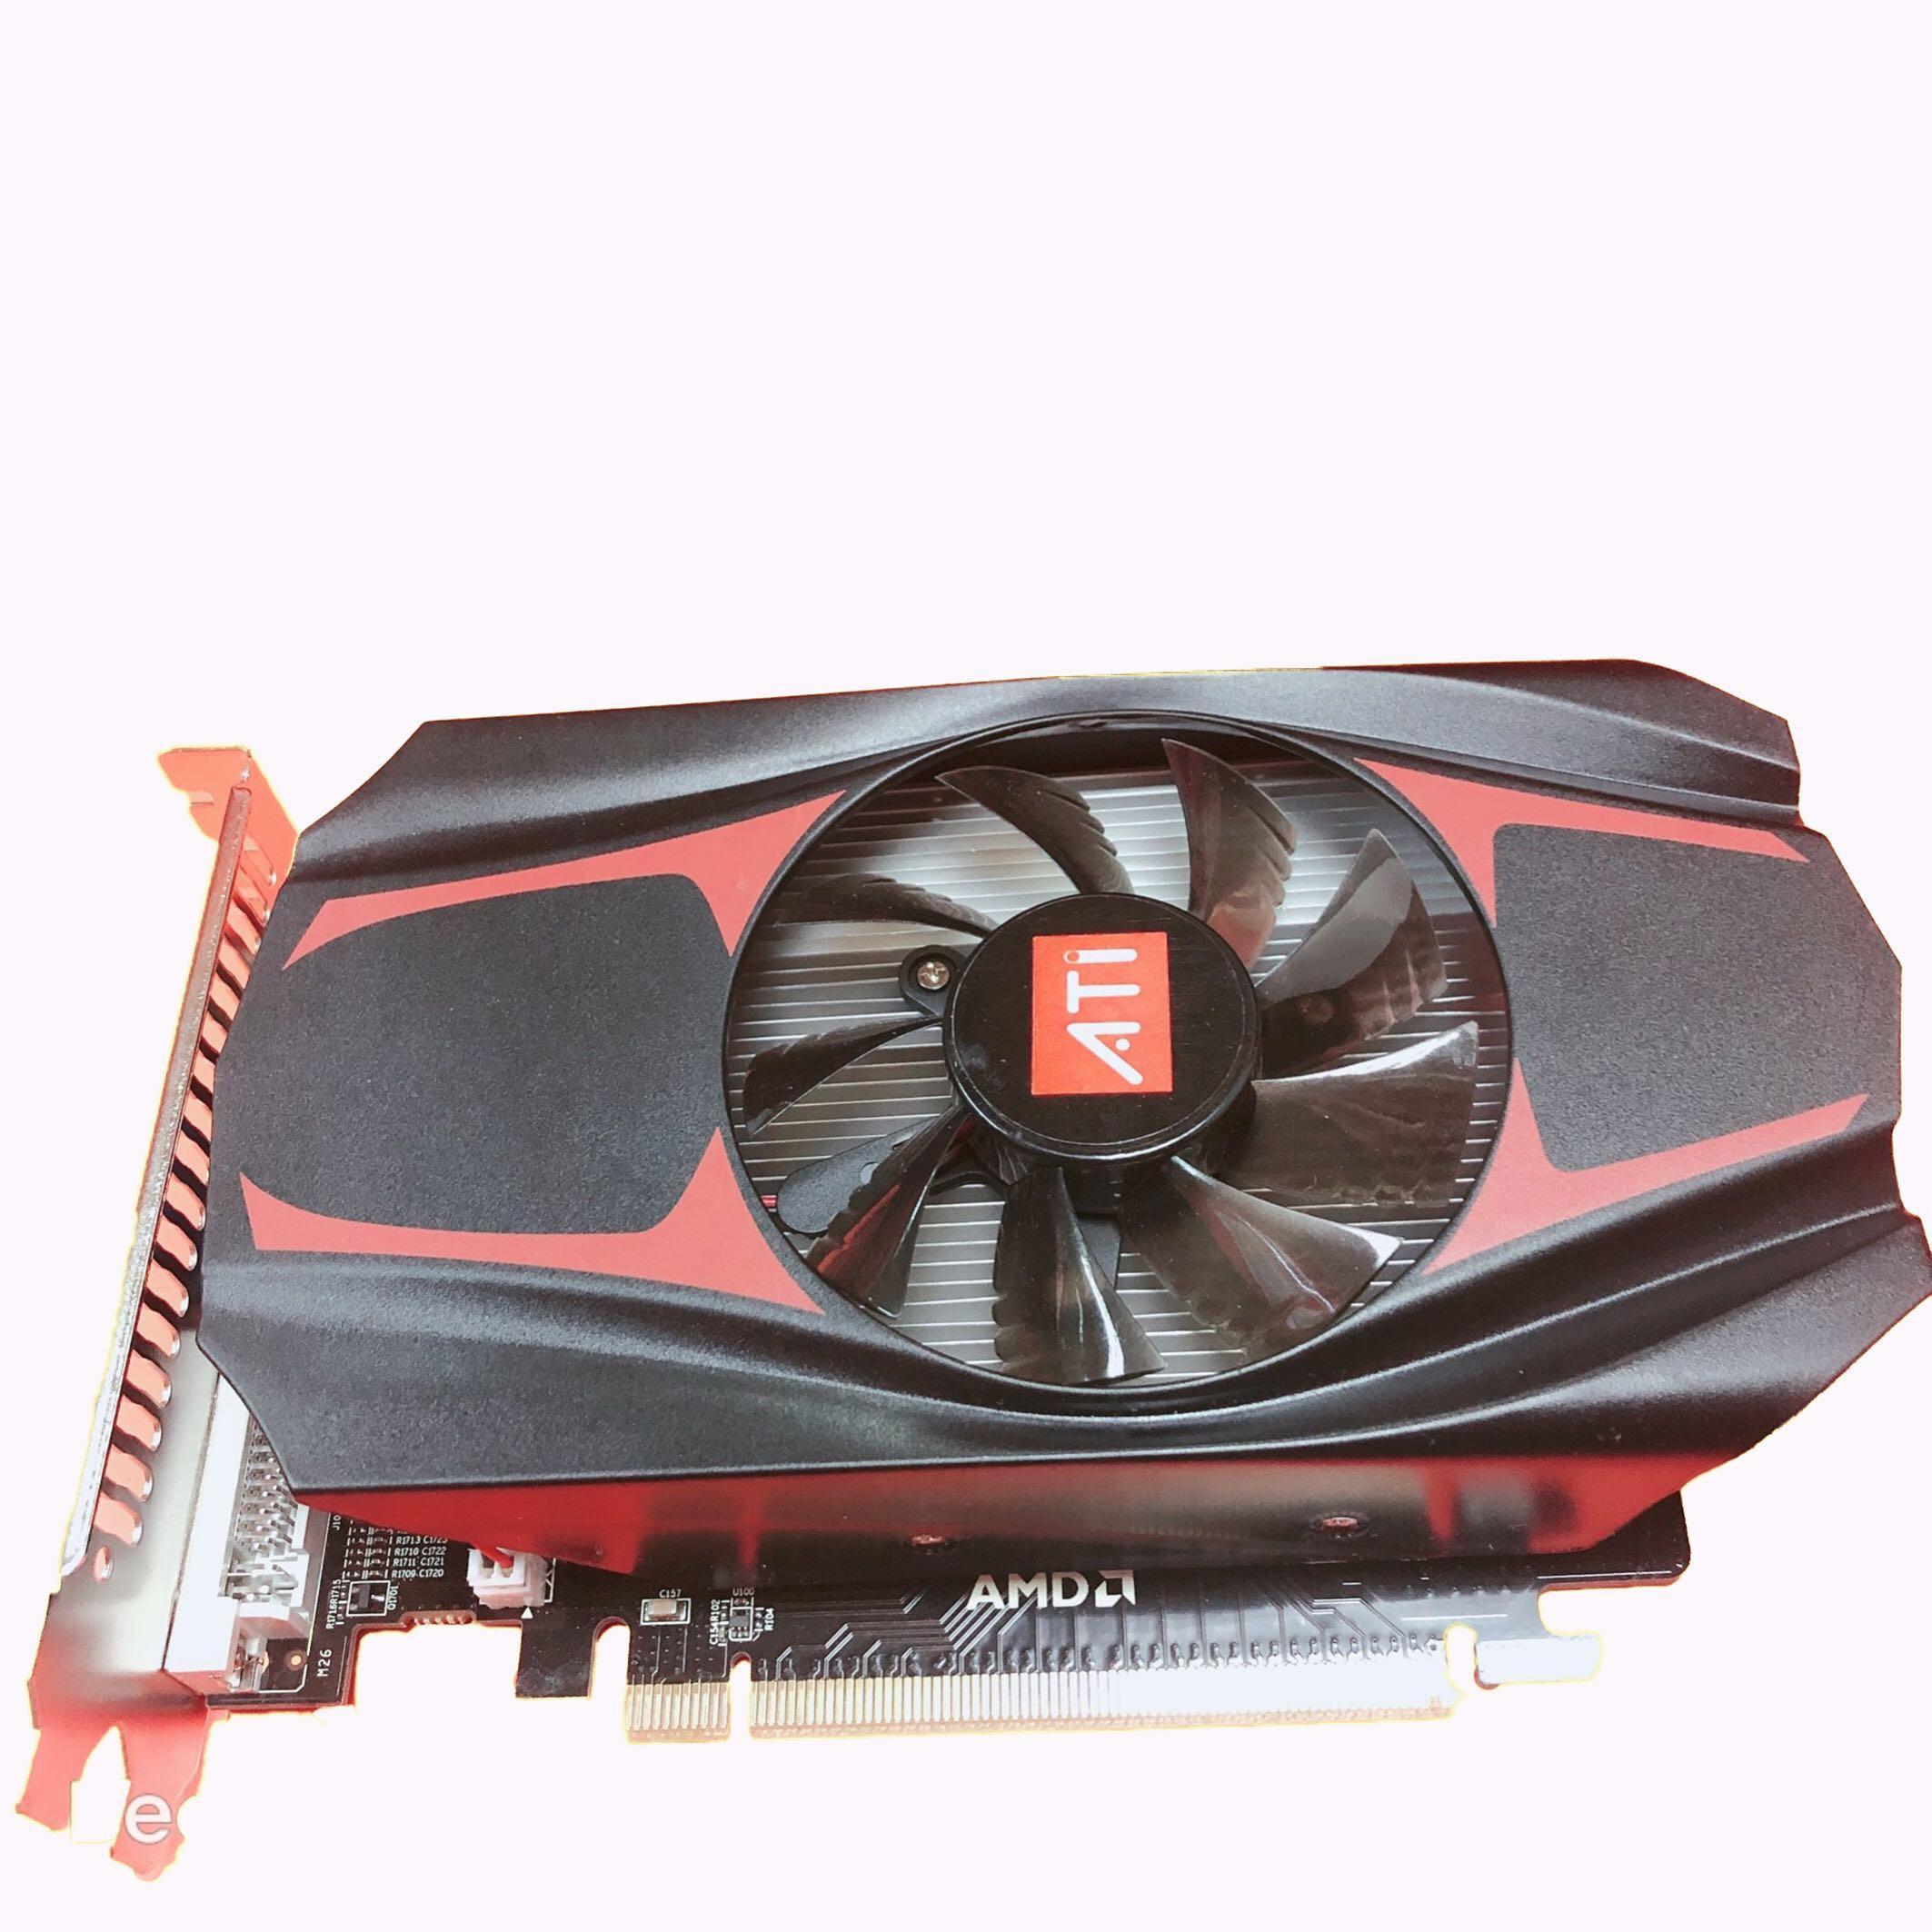 AMD HD7670 4G 游戲裝機升級臺式機獨立顯卡 Hd6770 4g 6570 7600